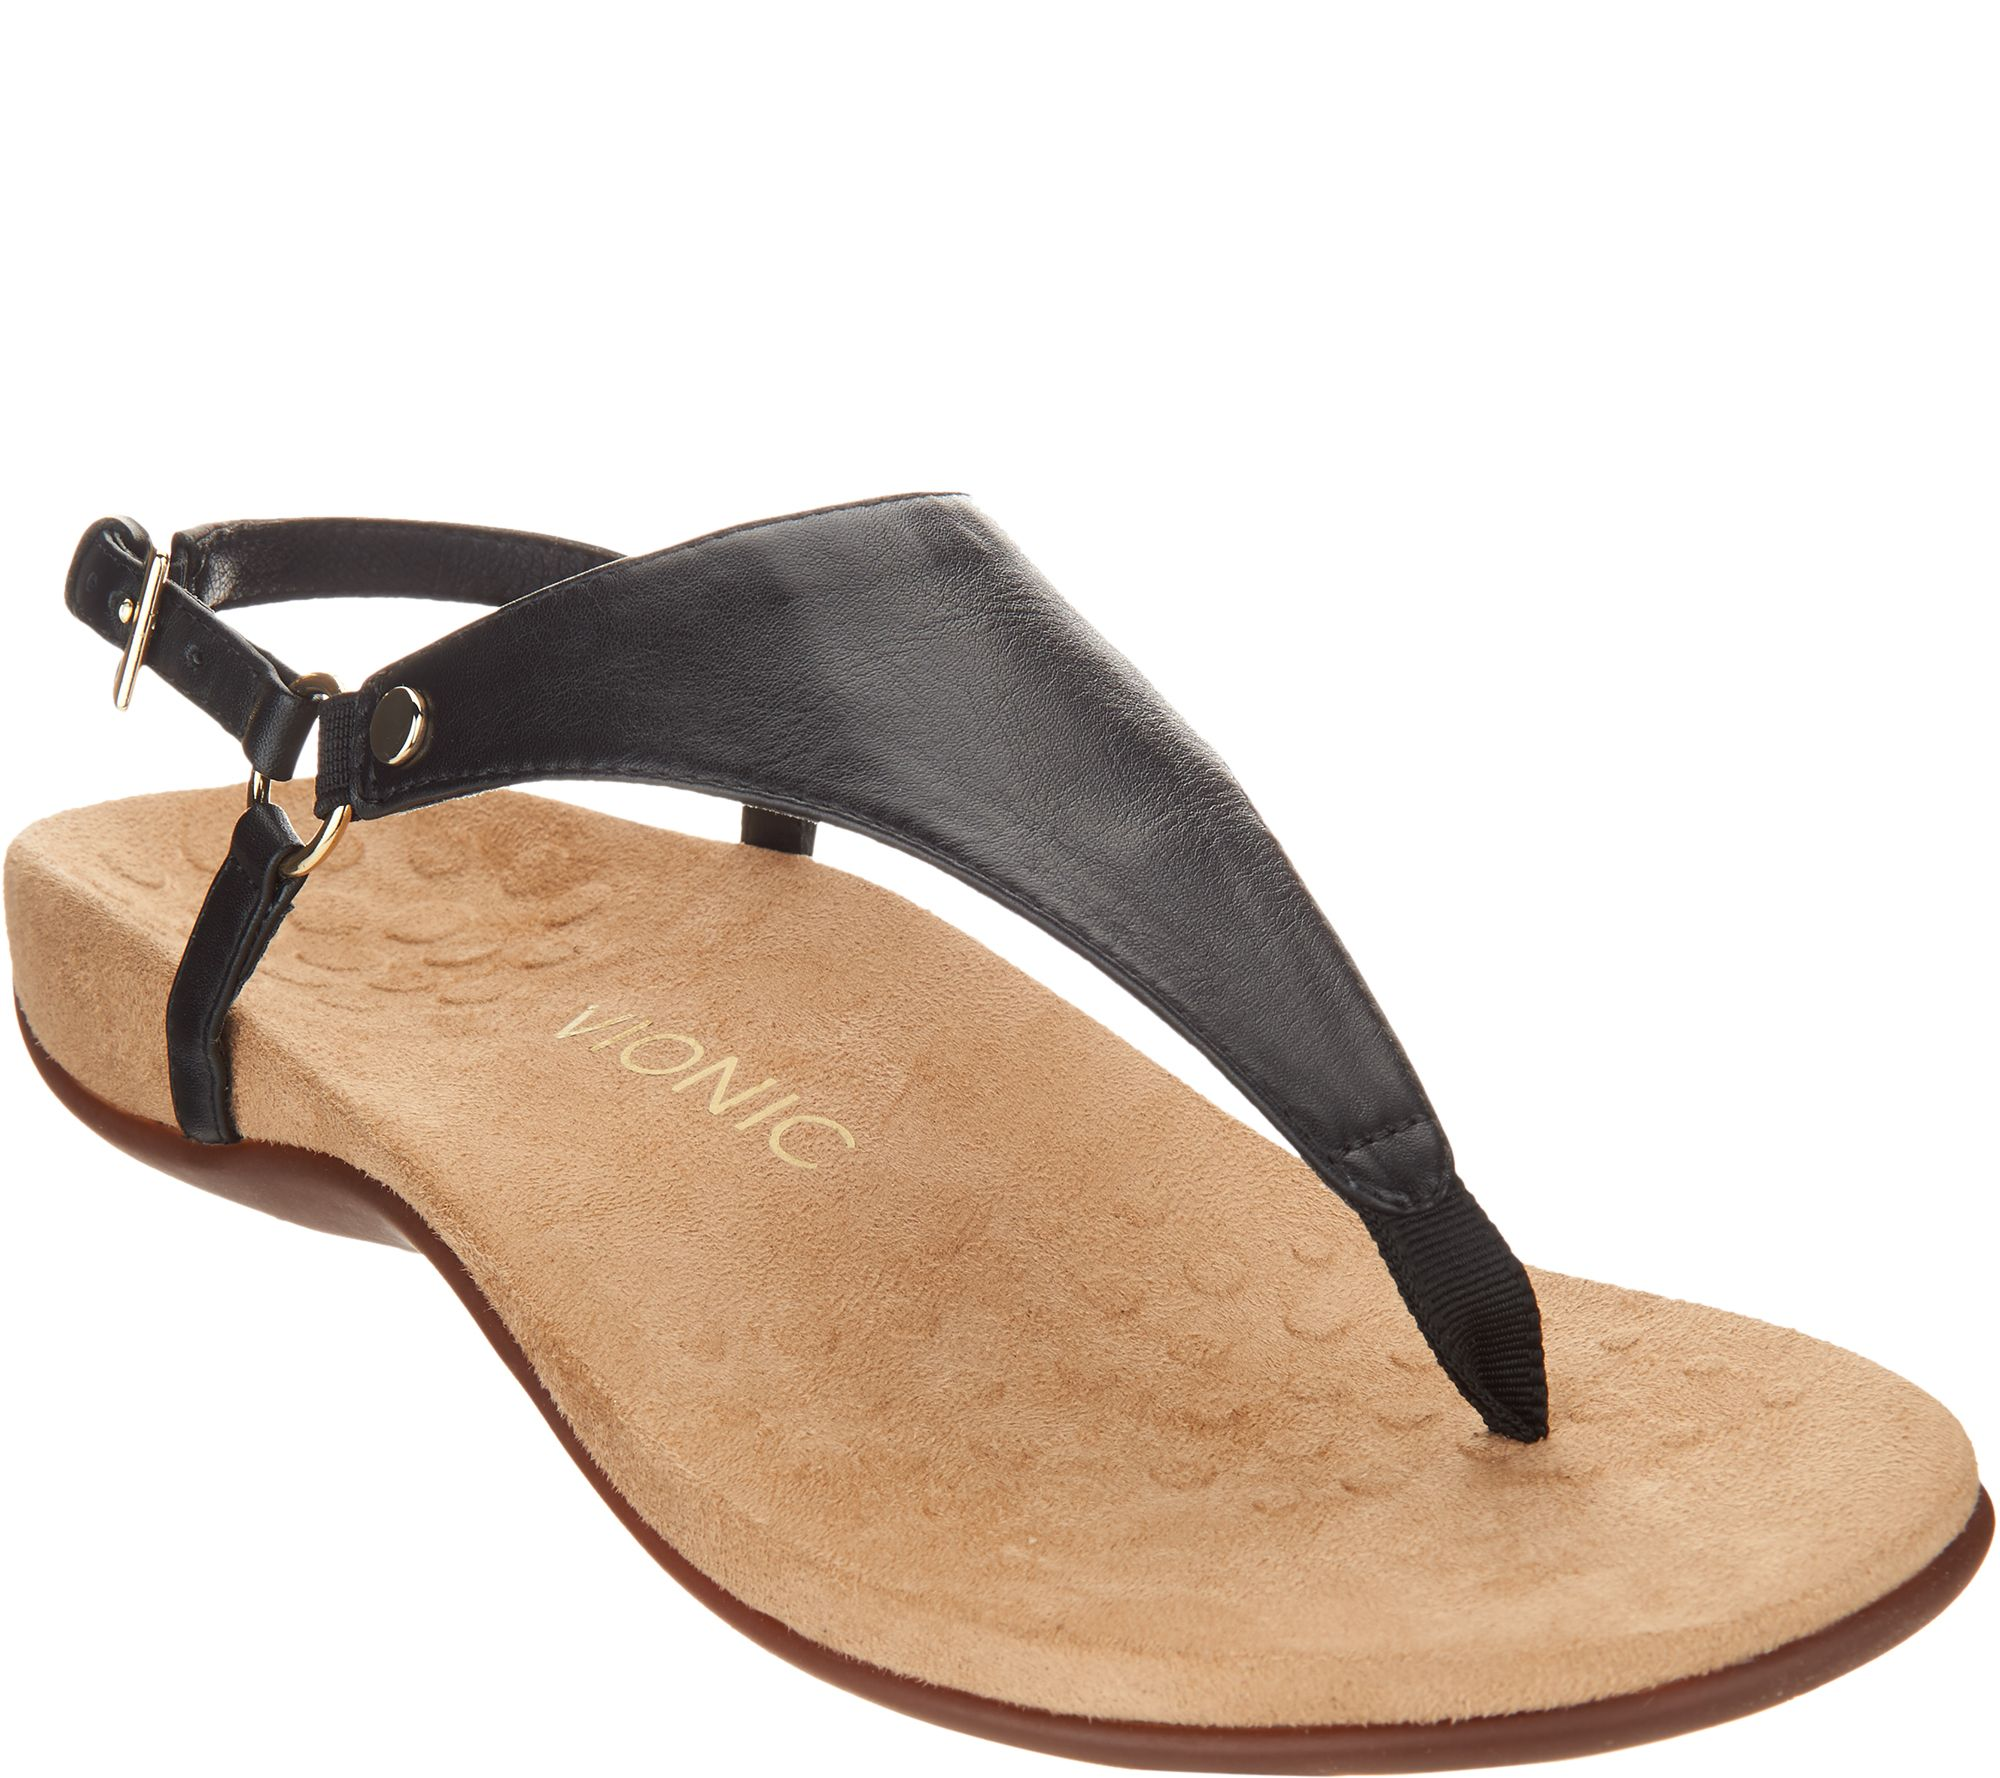 Vionic Kirra Snake Embossed Sandal - Wide Width Available jtpNPywWfK